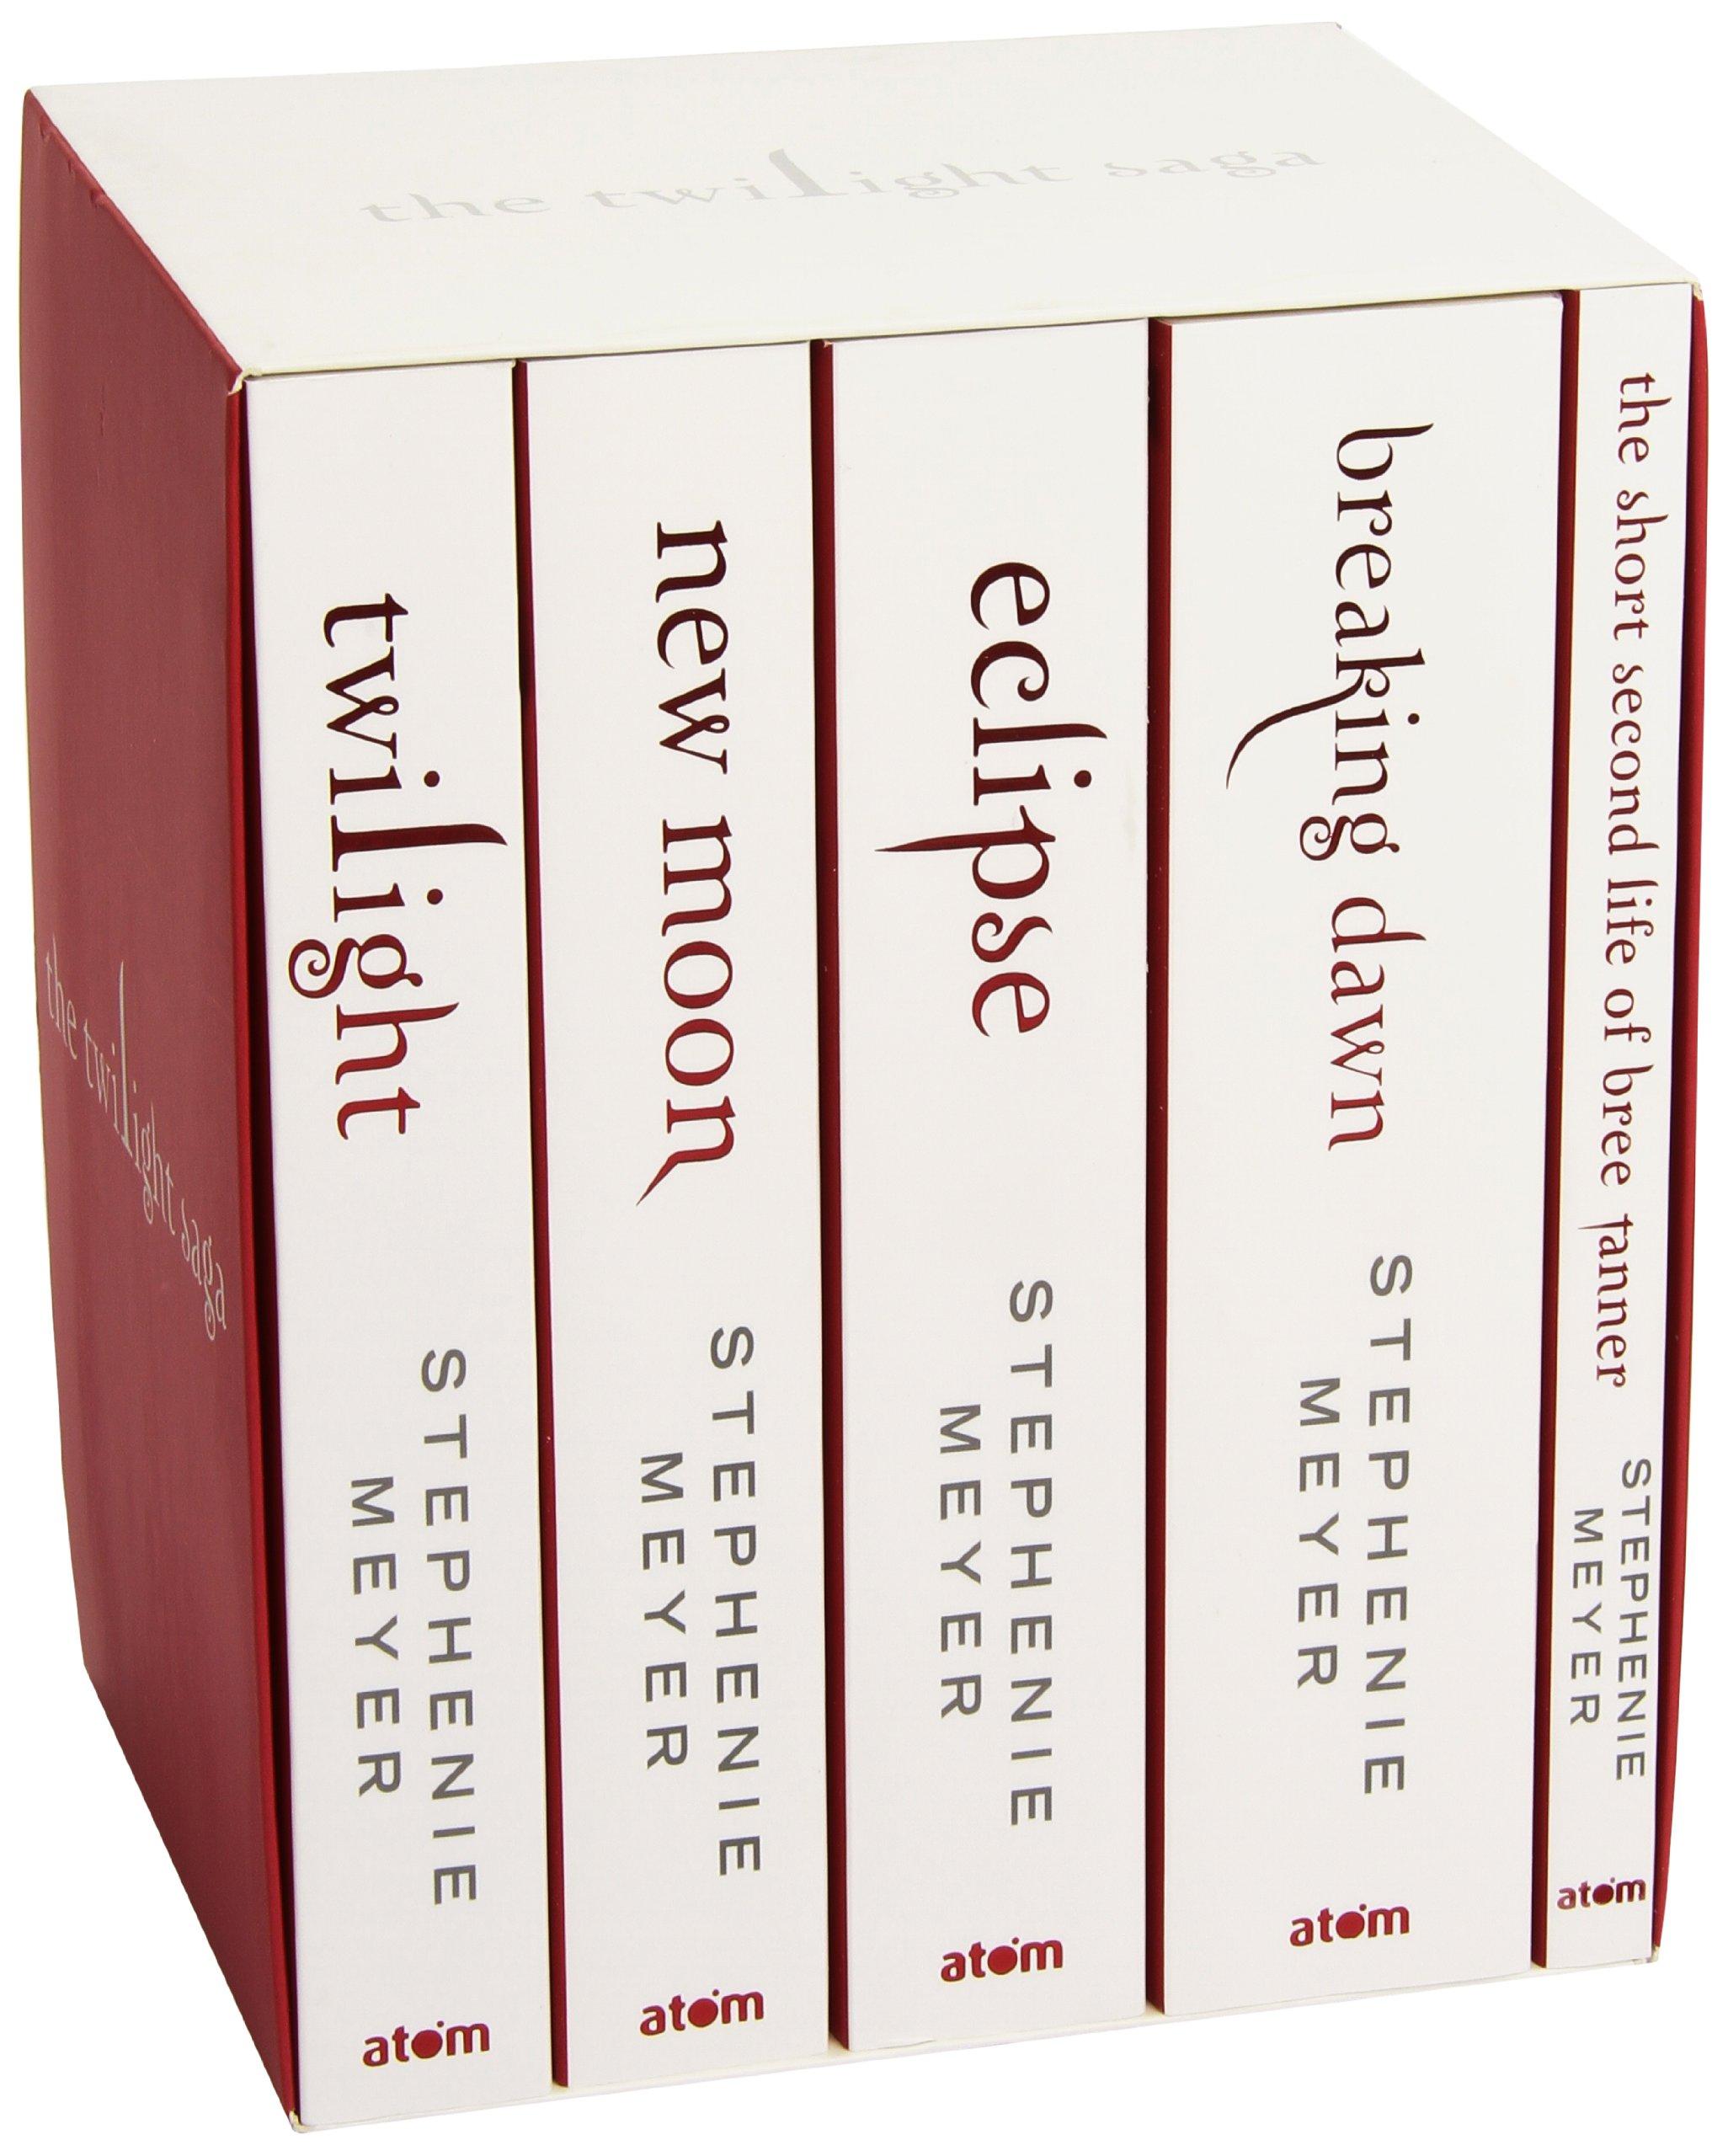 Twilight Saga (five Book Set): Amazon: Stephenie Meyer:  0000349001324: Books